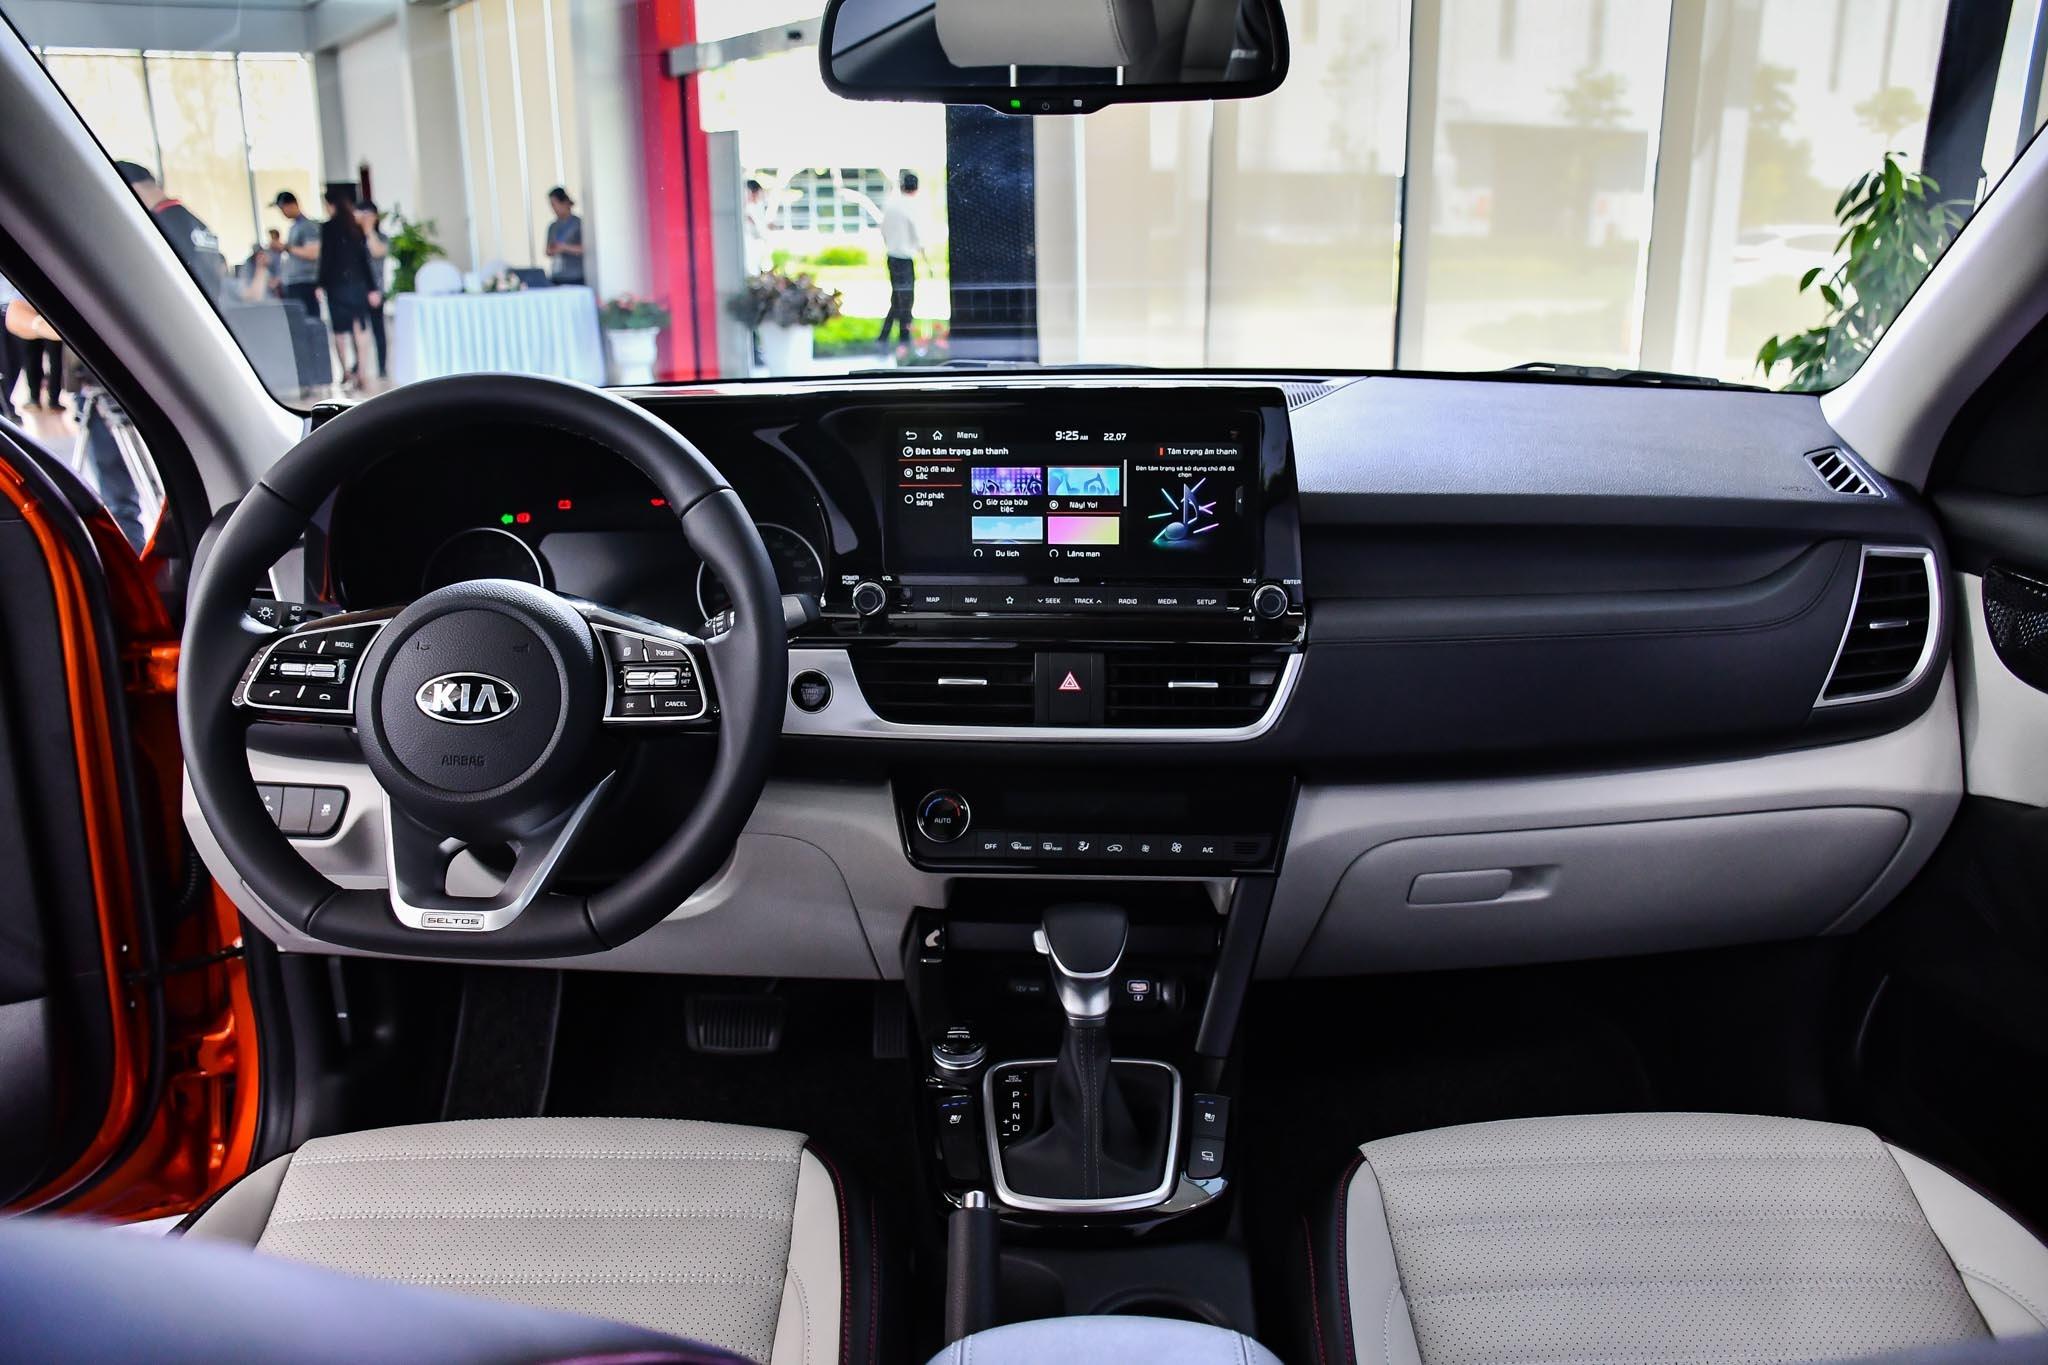 Chon Kia Seltos 1.4 Premium hay Toyota Corolla Cross 1.8V? anh 11